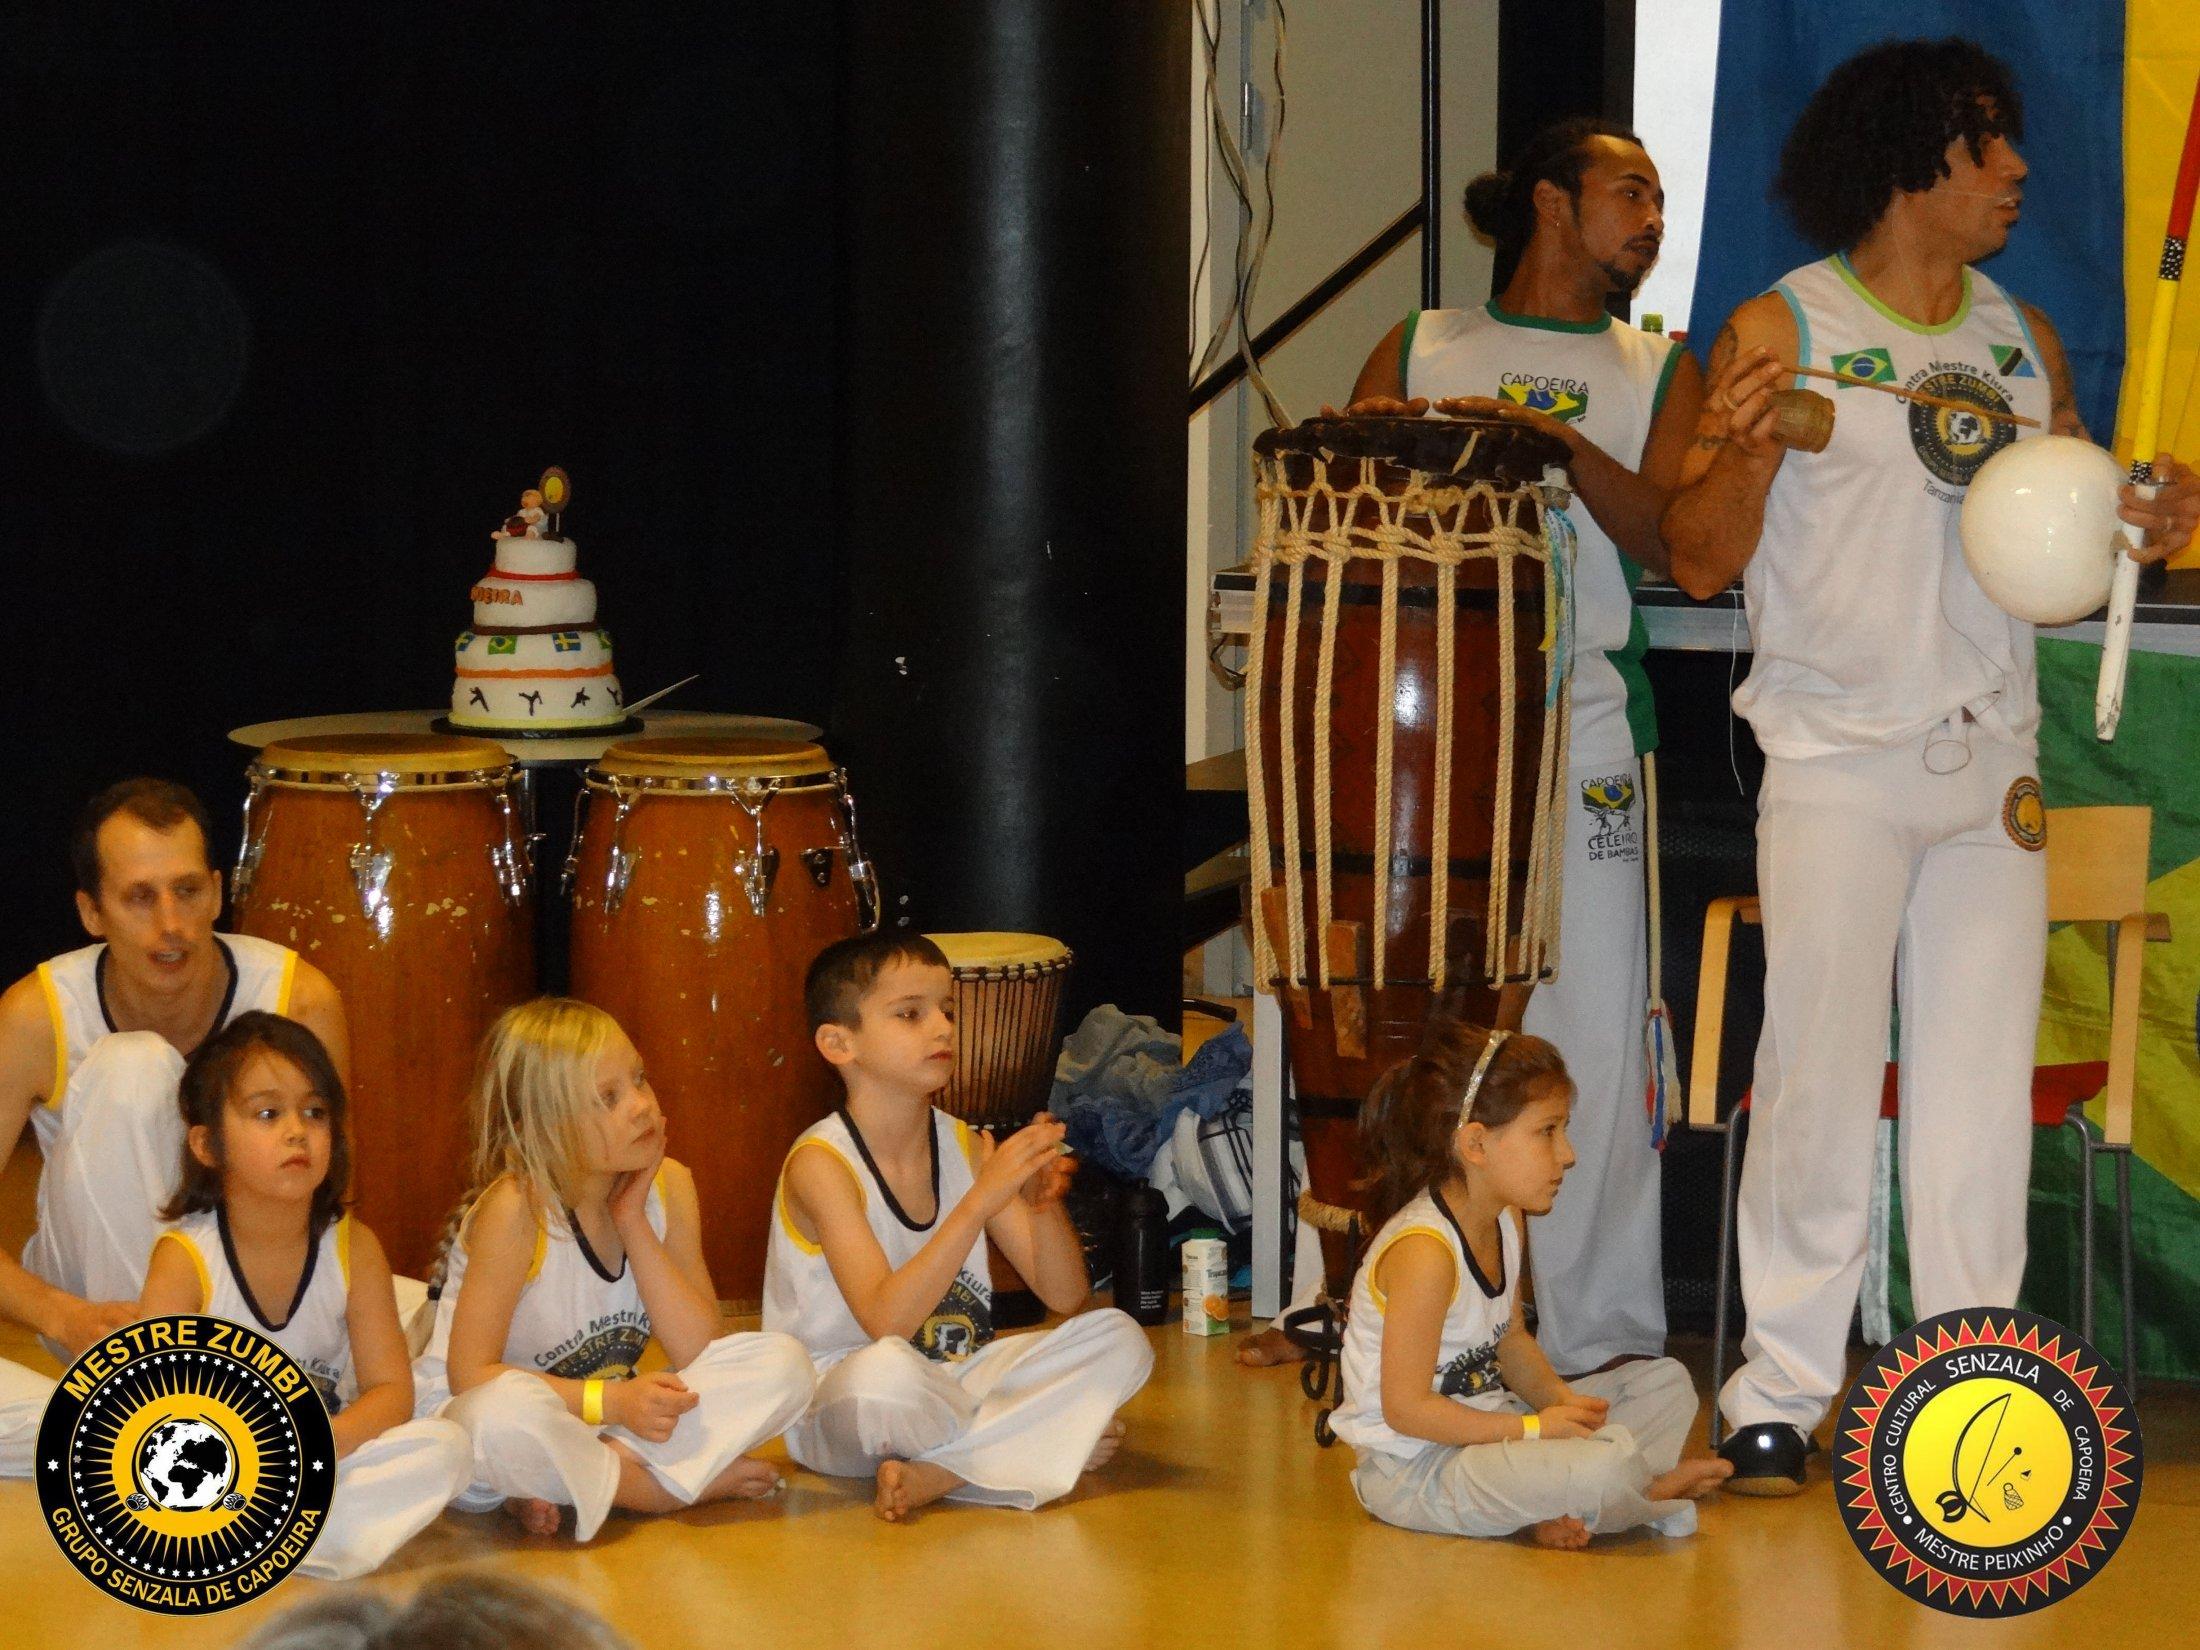 2013-12-14 - Capoeira 060